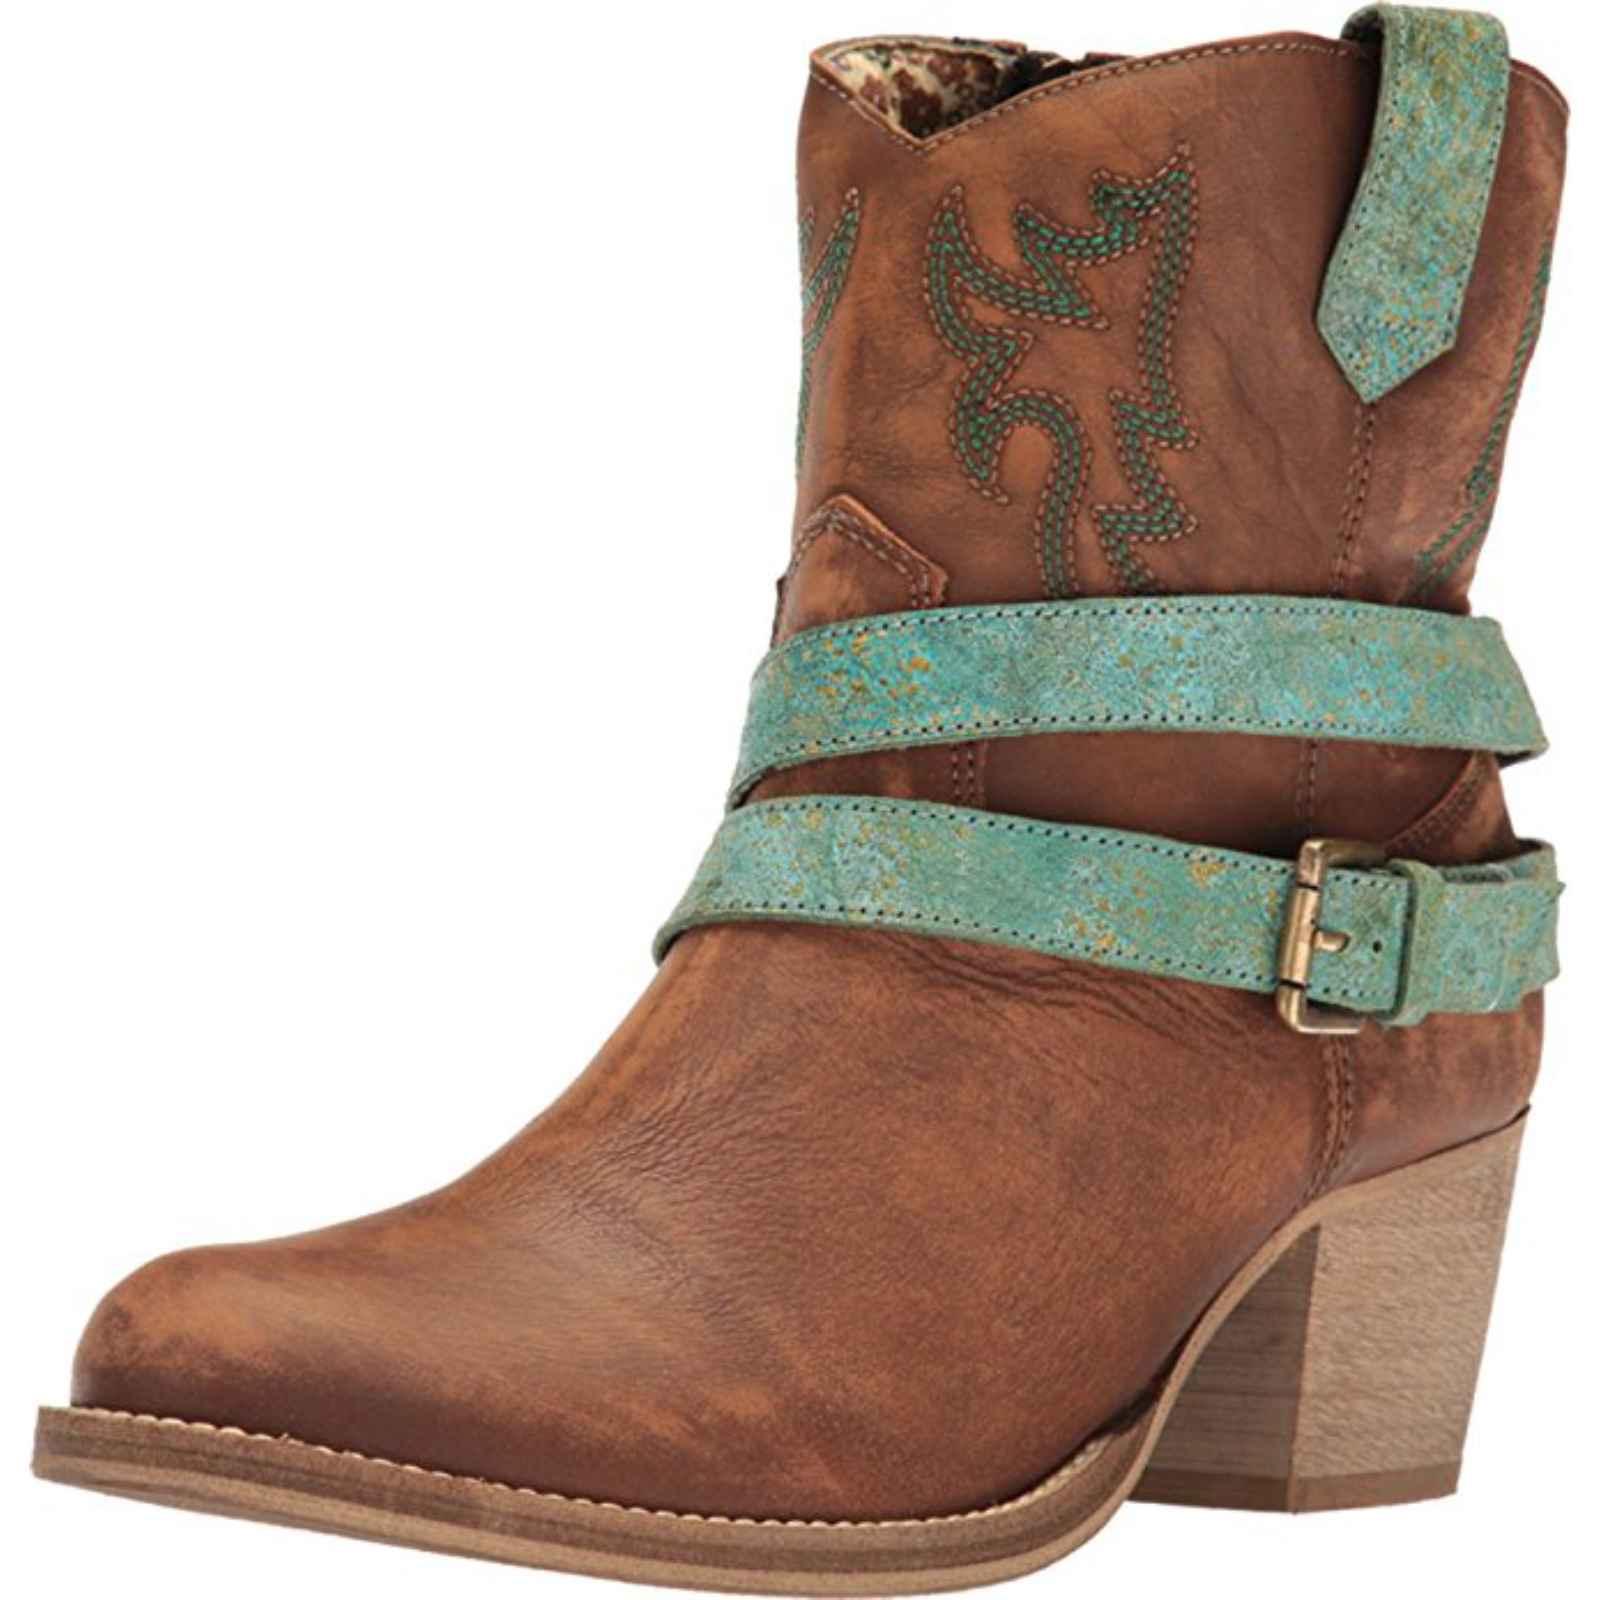 "Dingo Ladies 7"" Boot W Double Strap Round Toe Tan, DI 655 by Dingo"